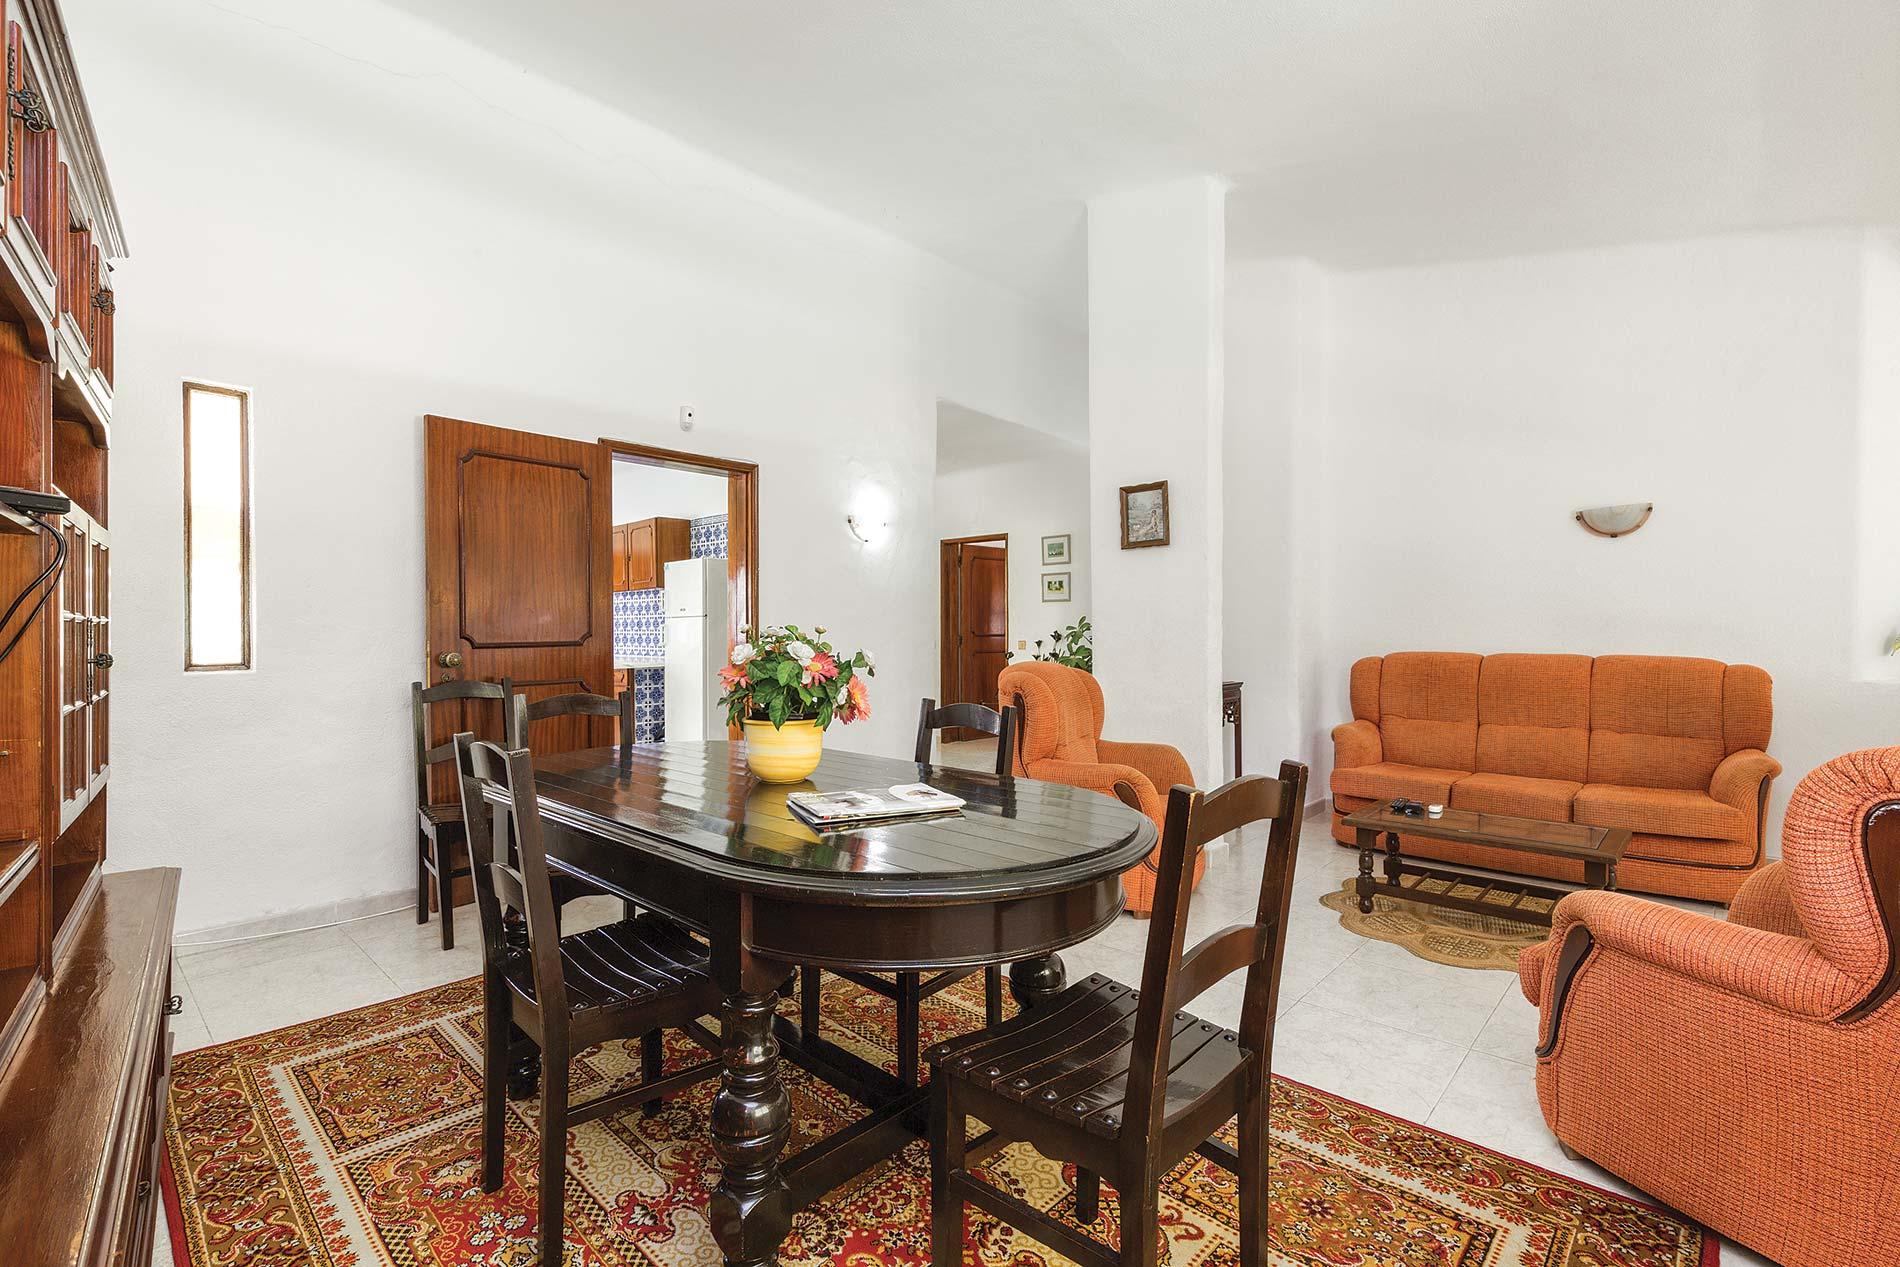 Graciete in Vilamoura, Algarve - sleeps 6 people